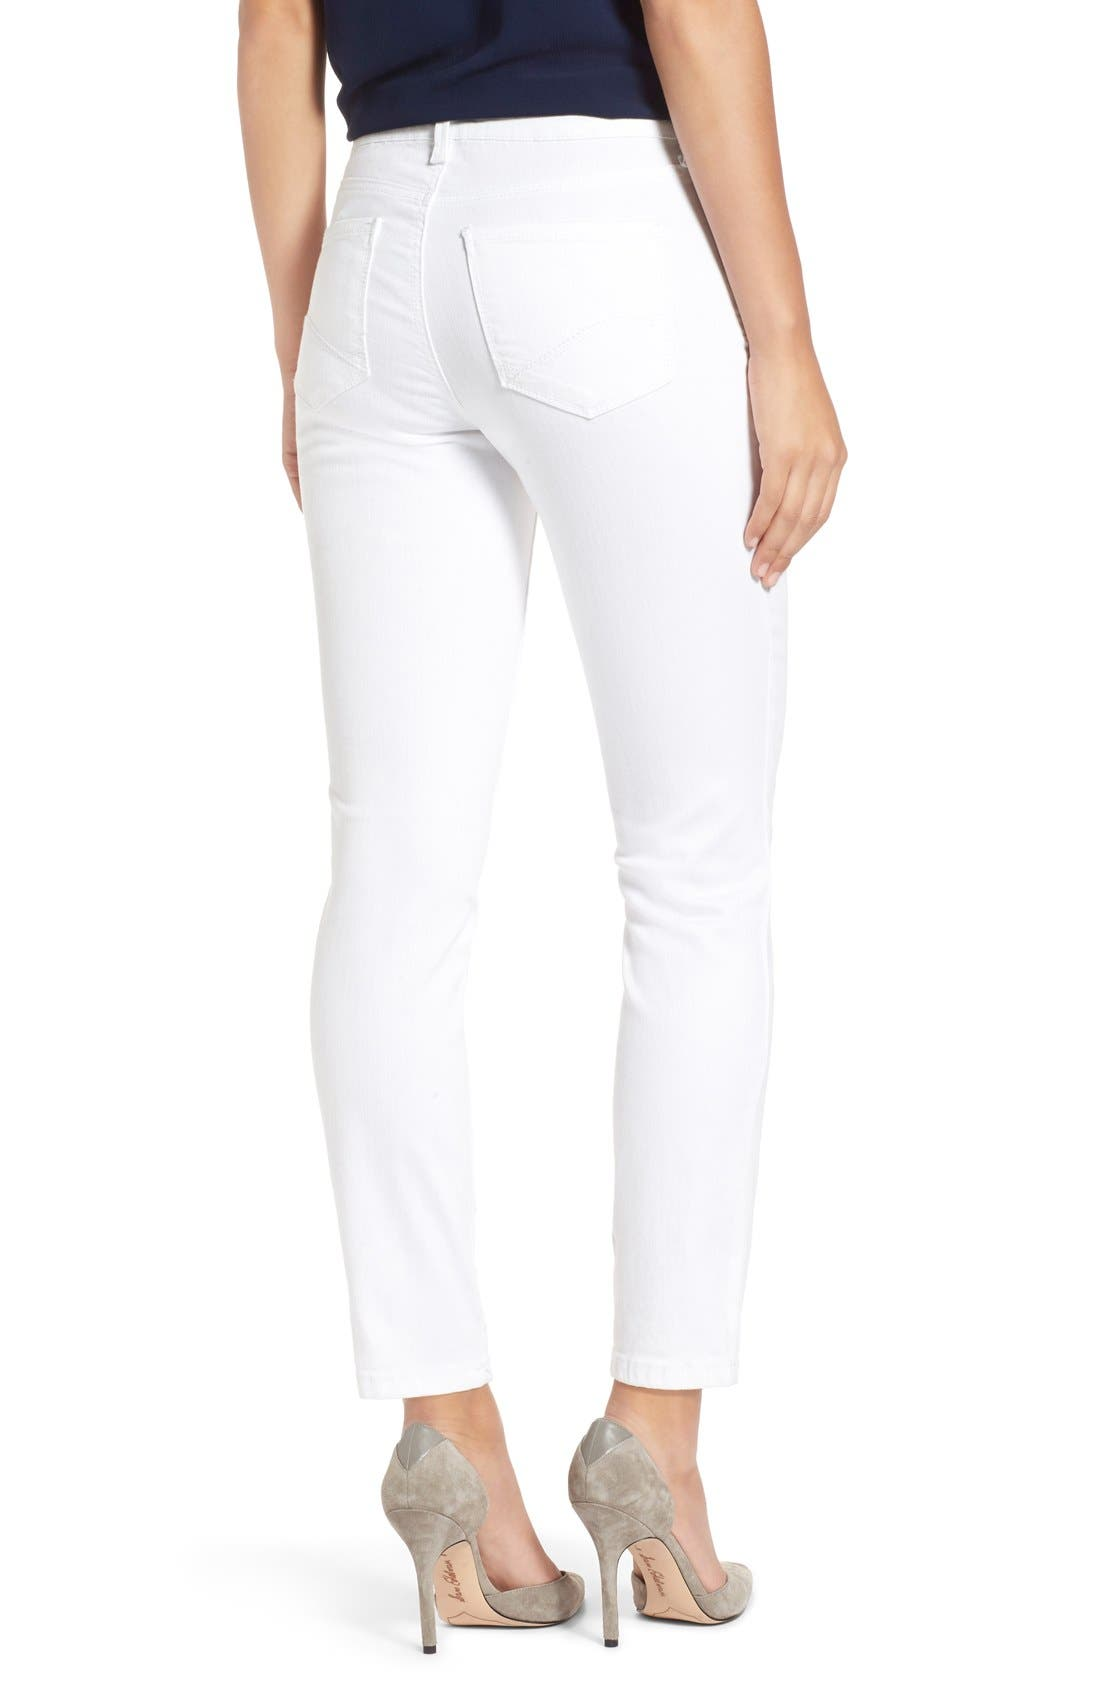 Alternate Image 2  - NYDJ Clarissa Colored Stretch Ankle Skinny Jeans (Regular & Petite)